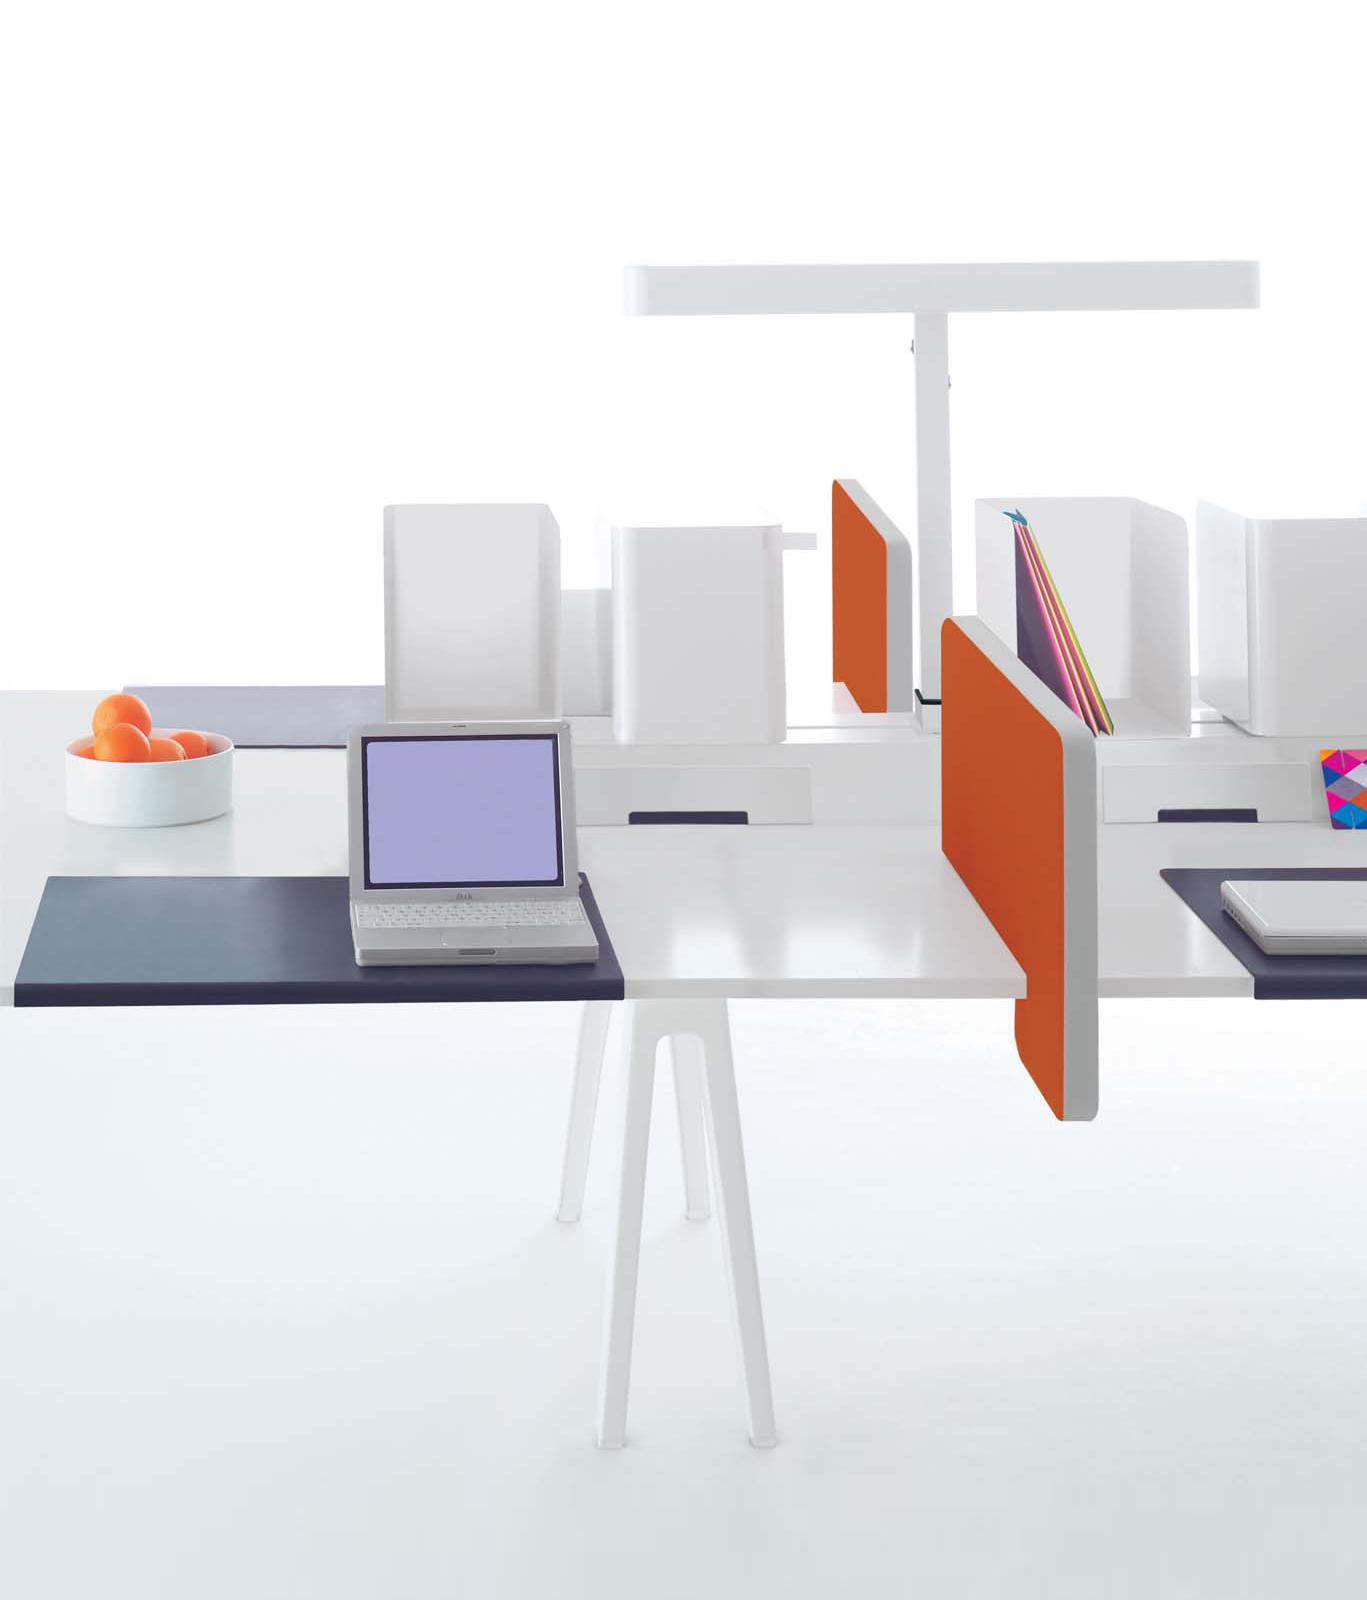 JOYN SINGLE DESK - Individual desks from Vitra | Architonic - Ambient images. Joyn Single Desk by Vitra ...